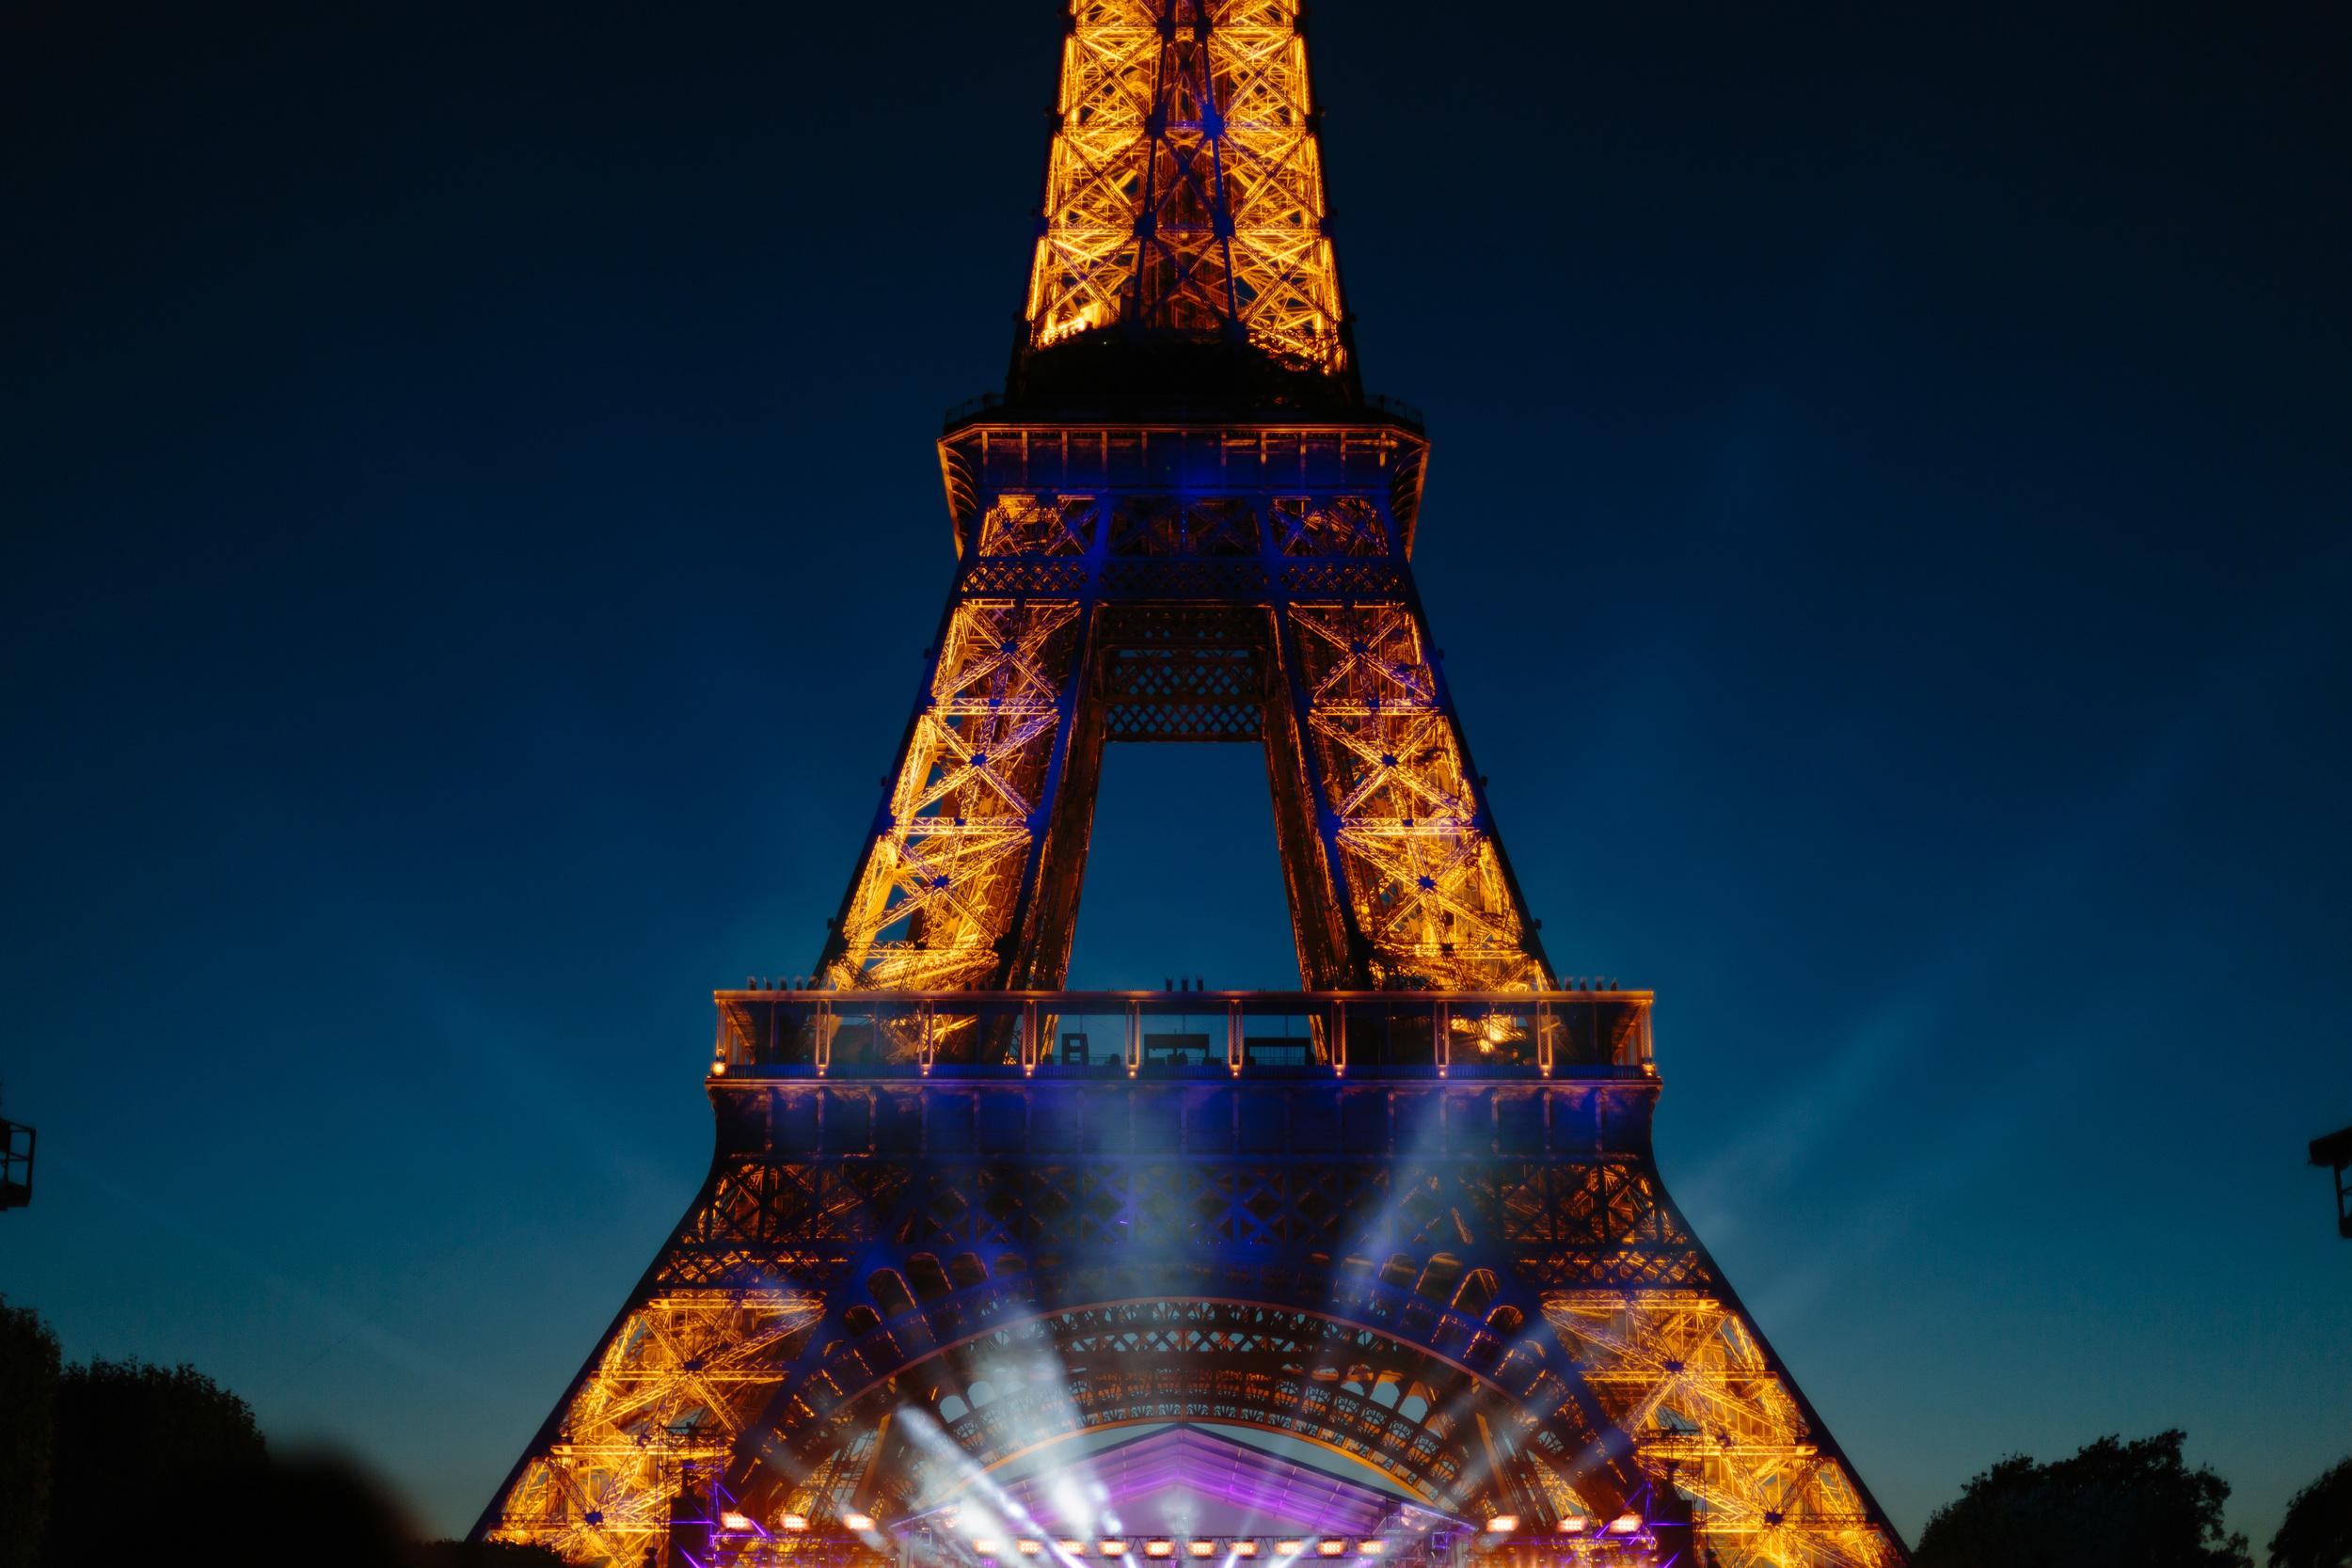 Photographer in Paris, Fireworks, 14 juillet, 14 July, Bastille 2015, Tour Eiffel, Iheartparisfr